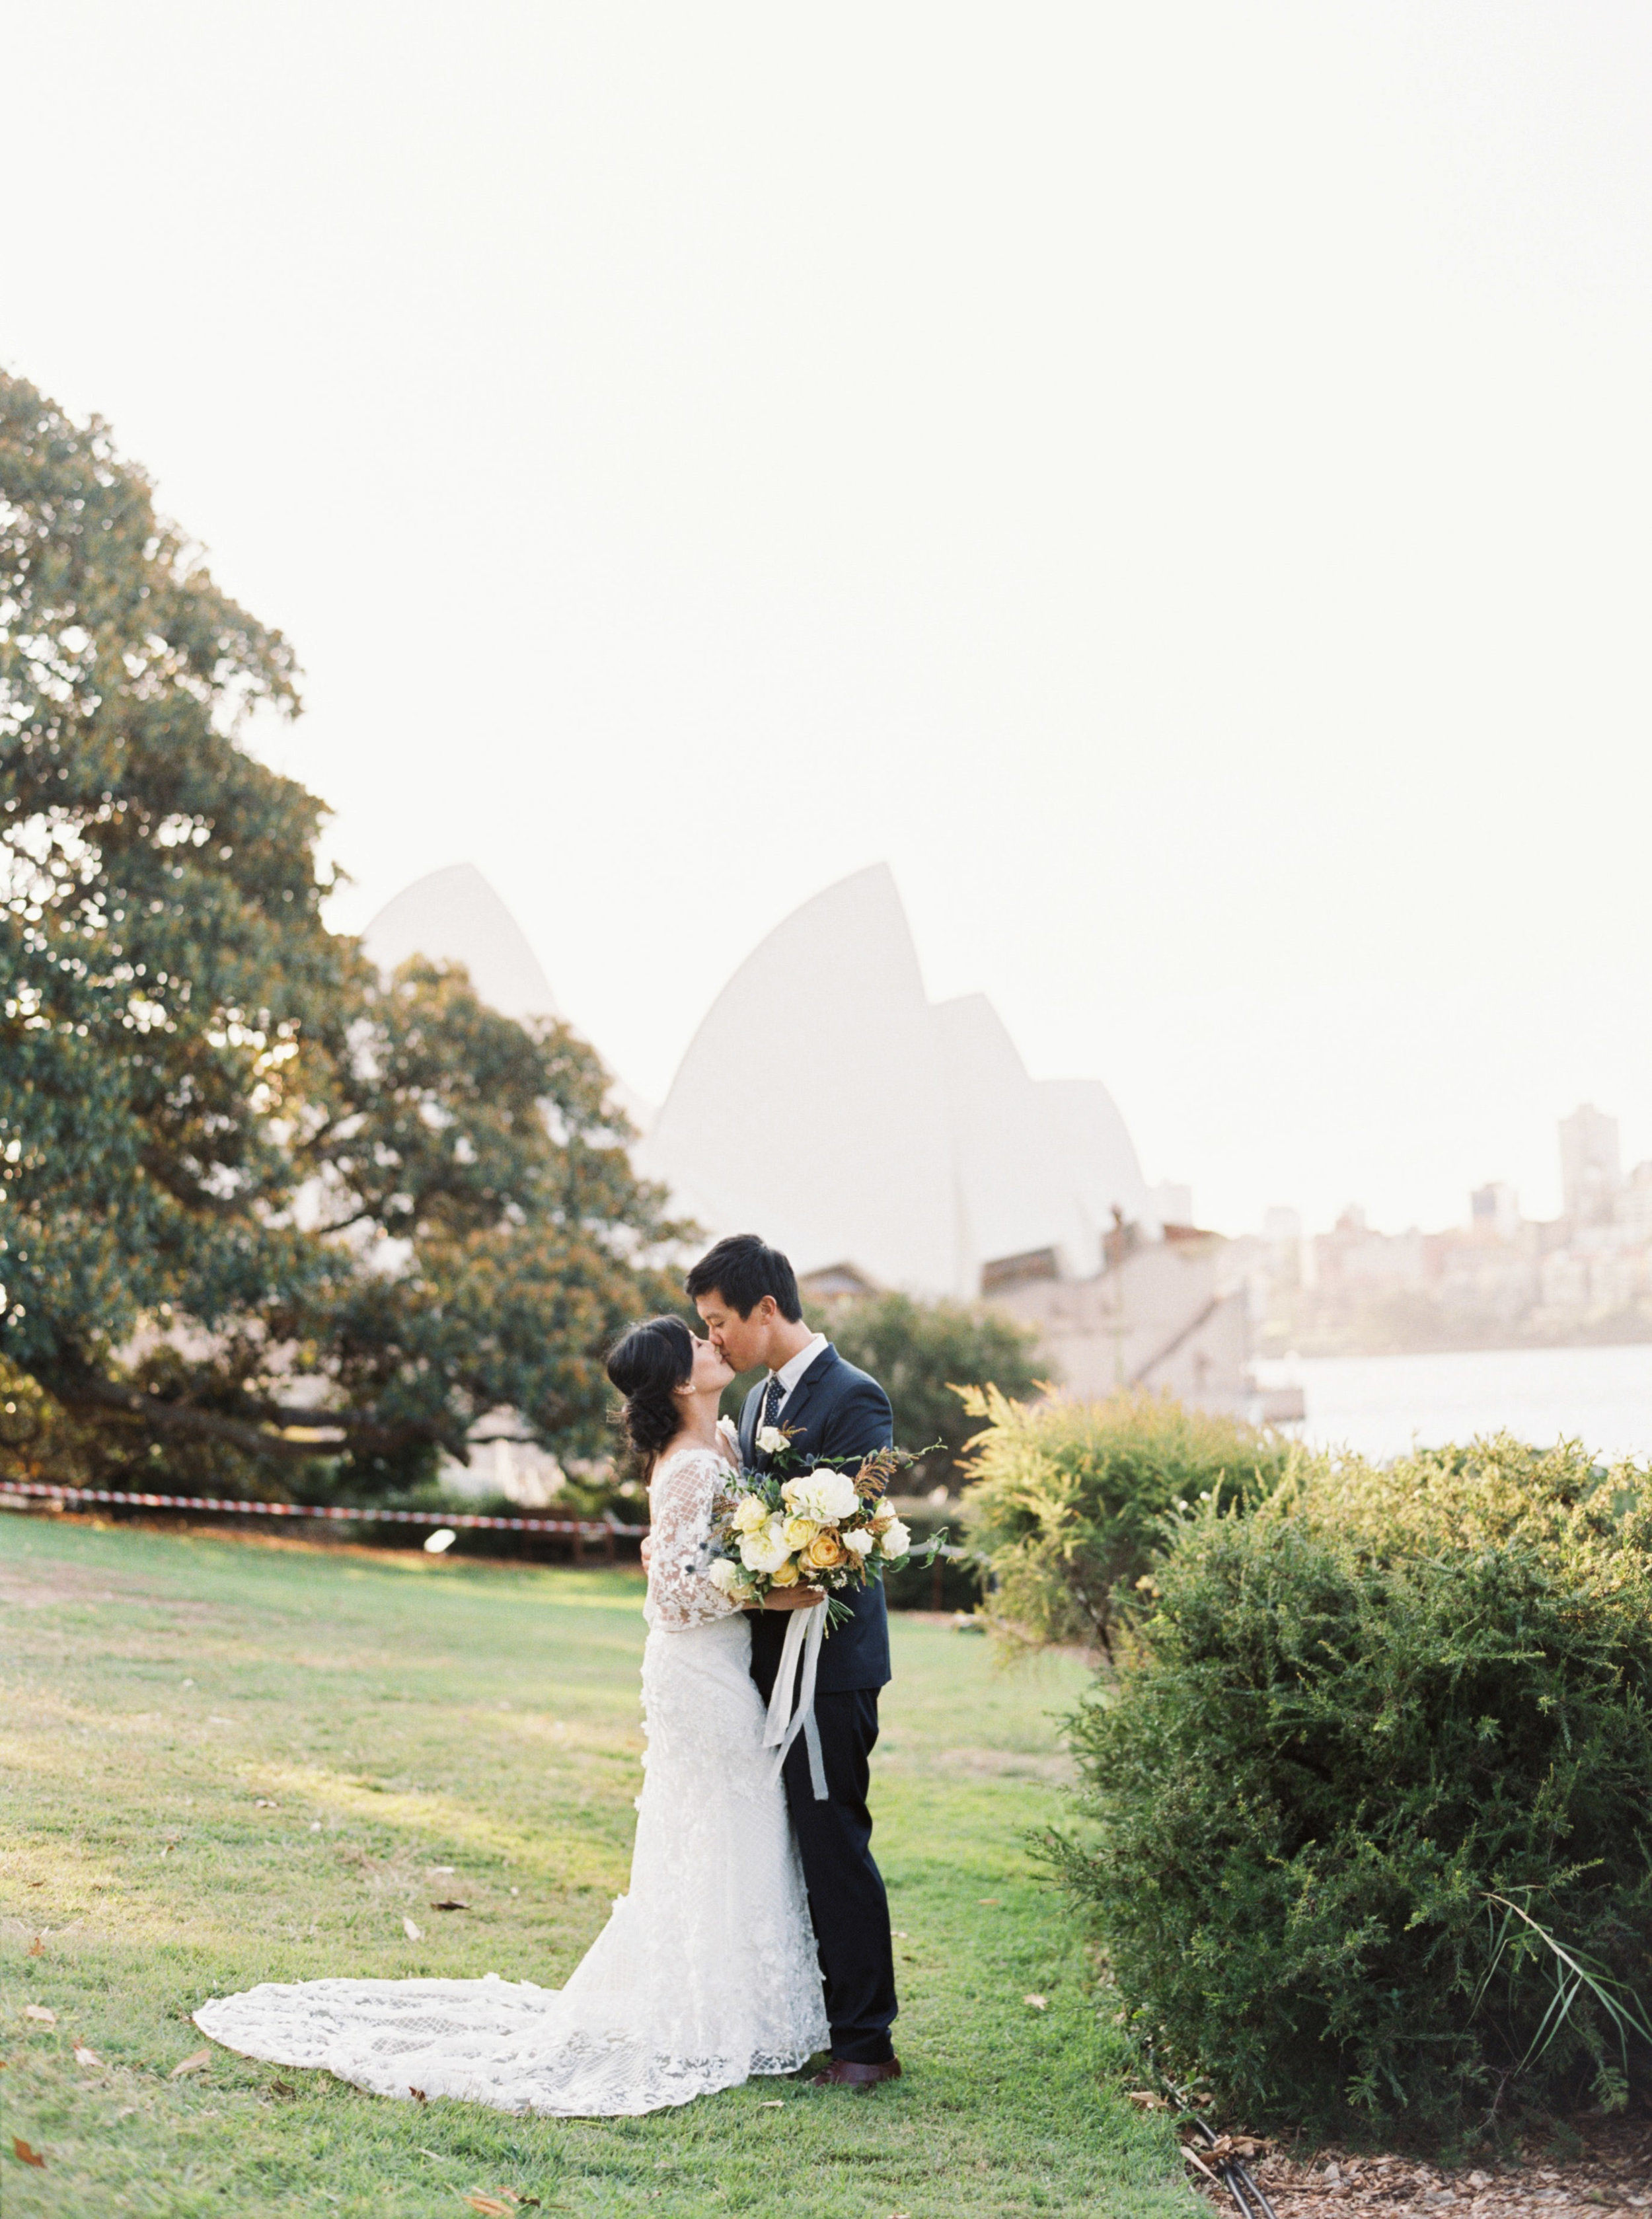 00013- Australia Sydney Wedding Photographer Sheri McMahon.jpg